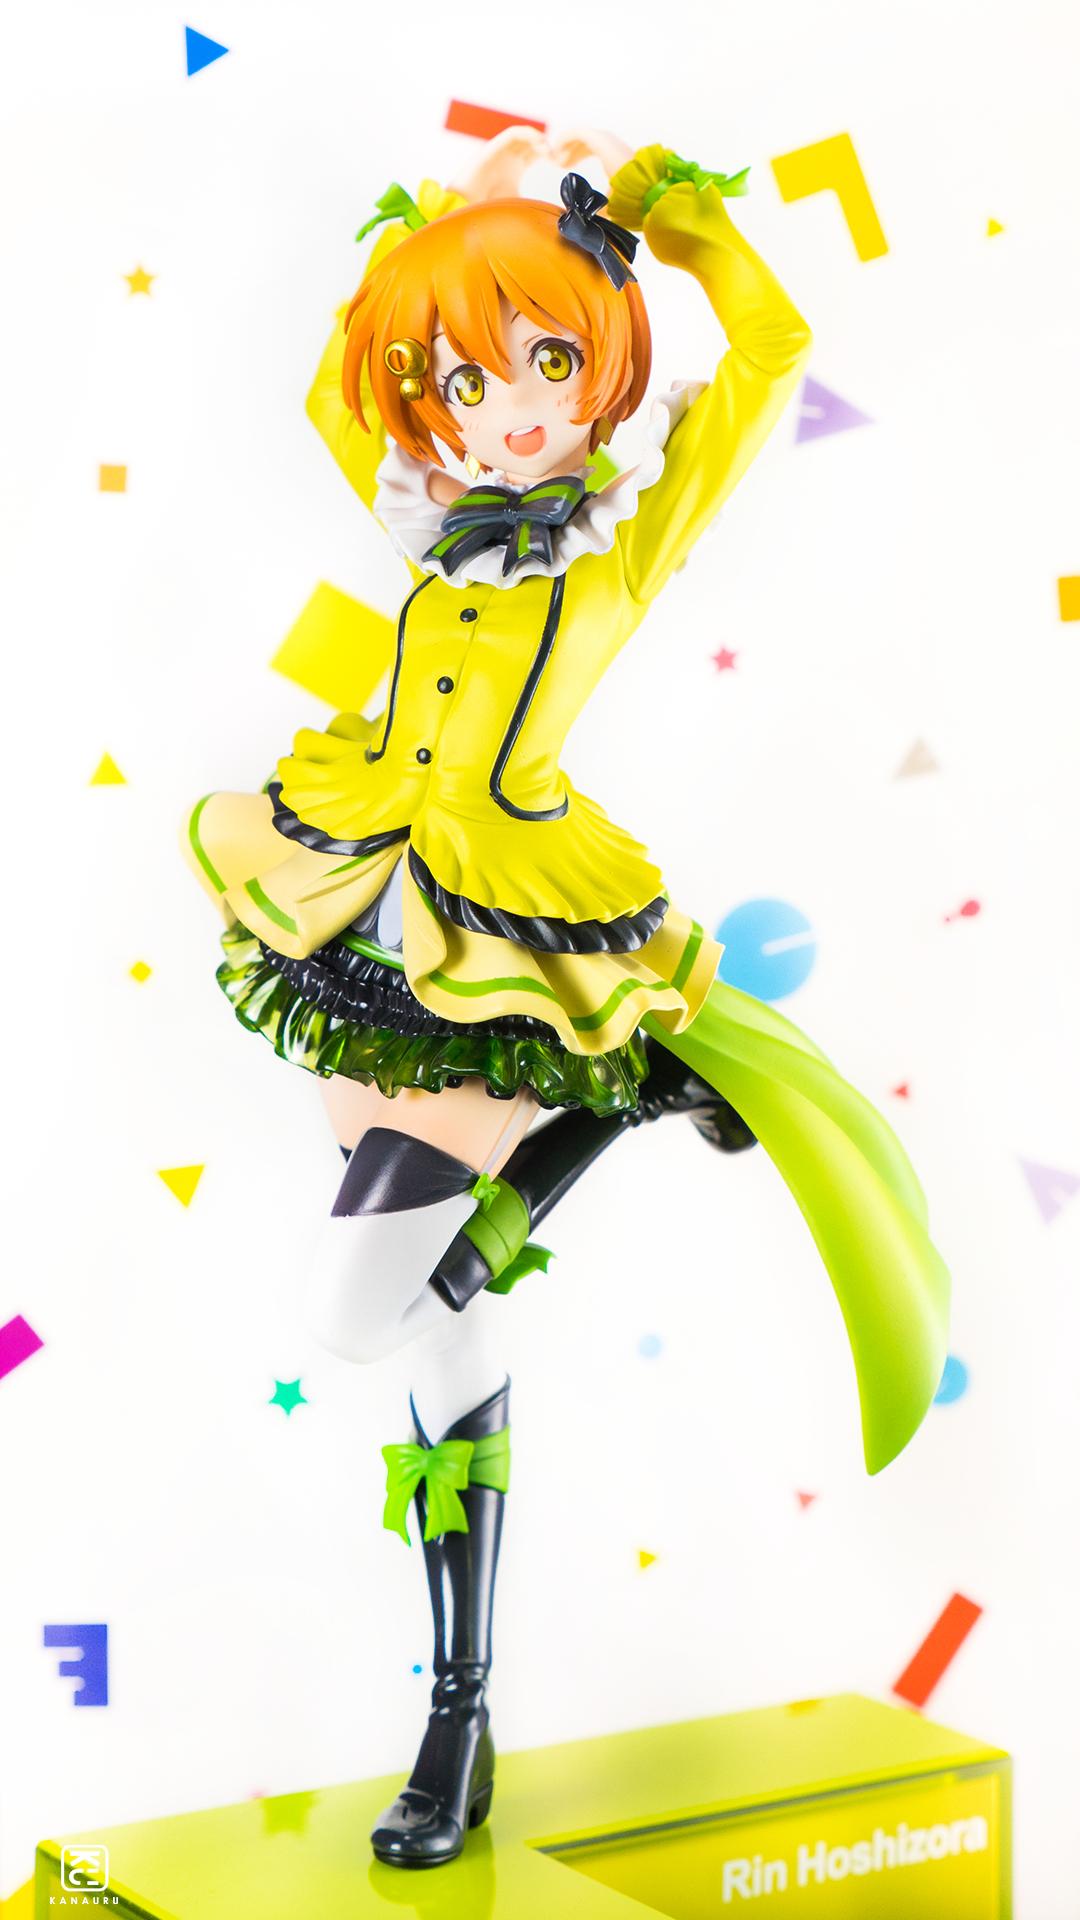 dengeki ascii_media_works kadokawa love_live!_school_idol_project miyajima_katsuyoshi hoshizora_rin deira stronger birthday_figure_project